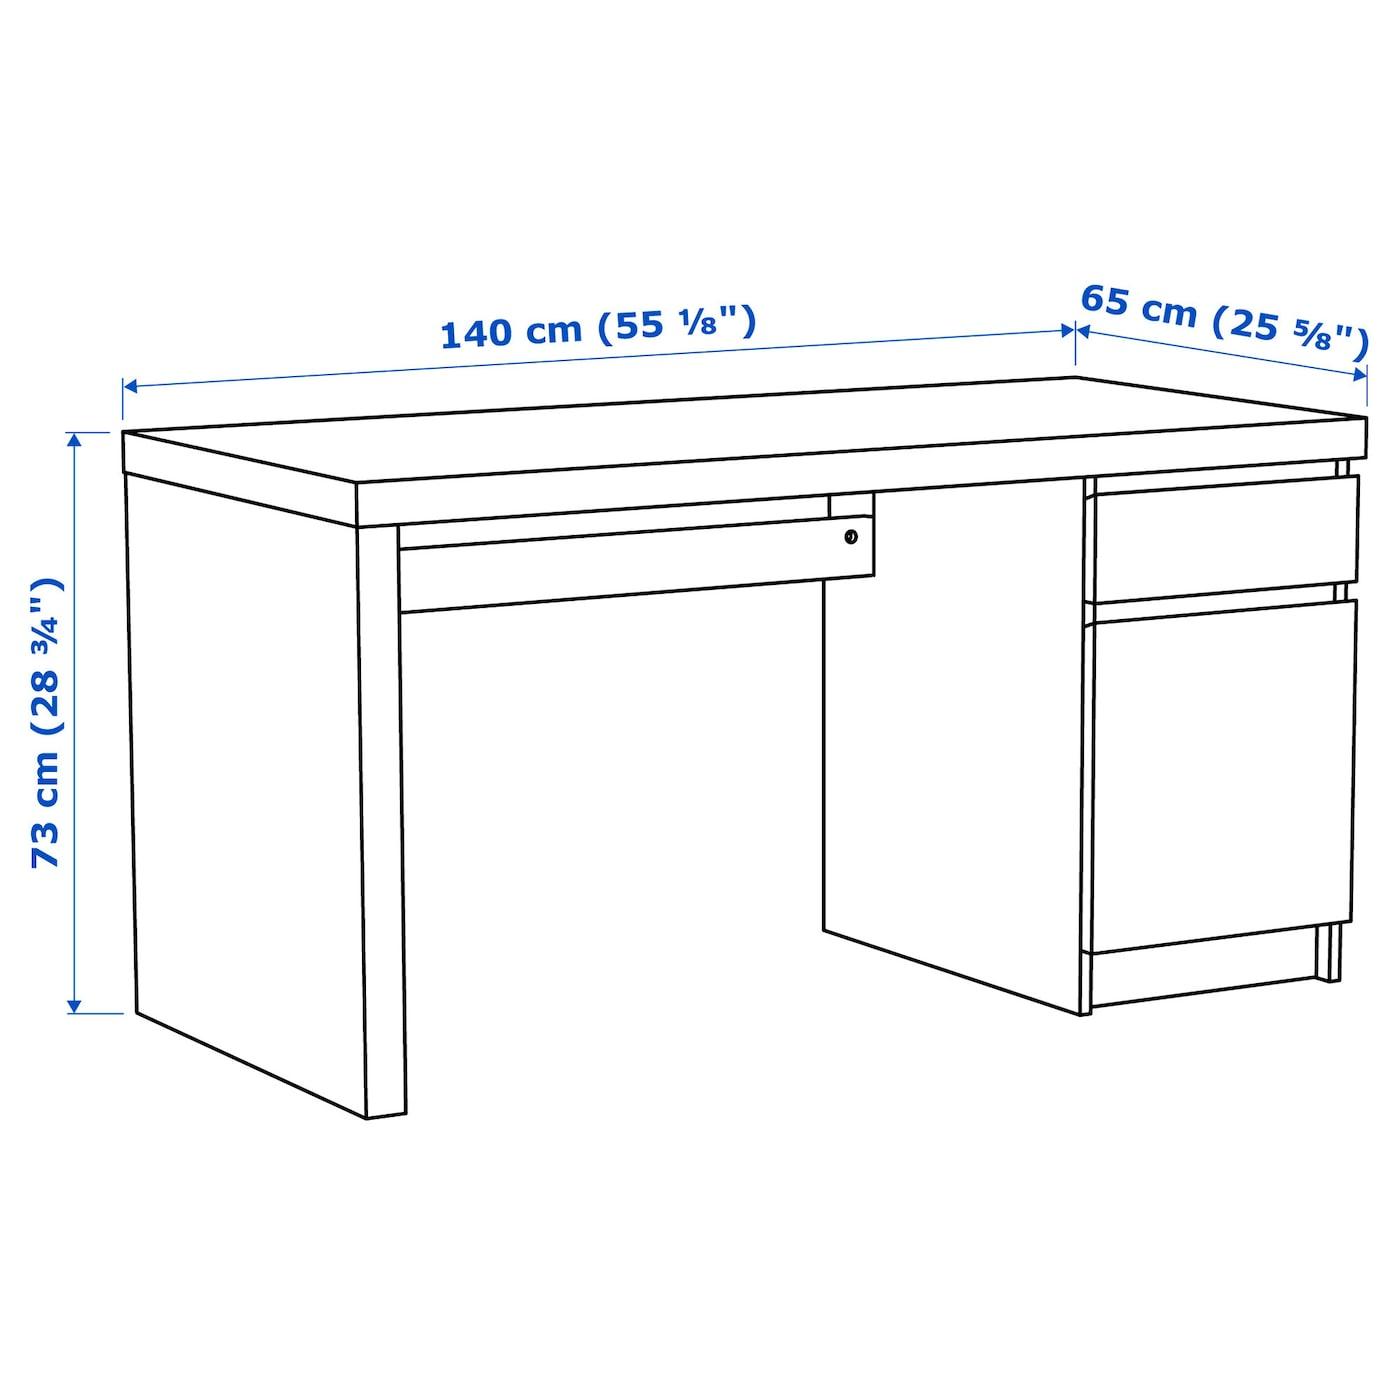 gb spr cm desk steady make white ikea computer the desks on uneven feet sit table products stand en skarsta adjustable also